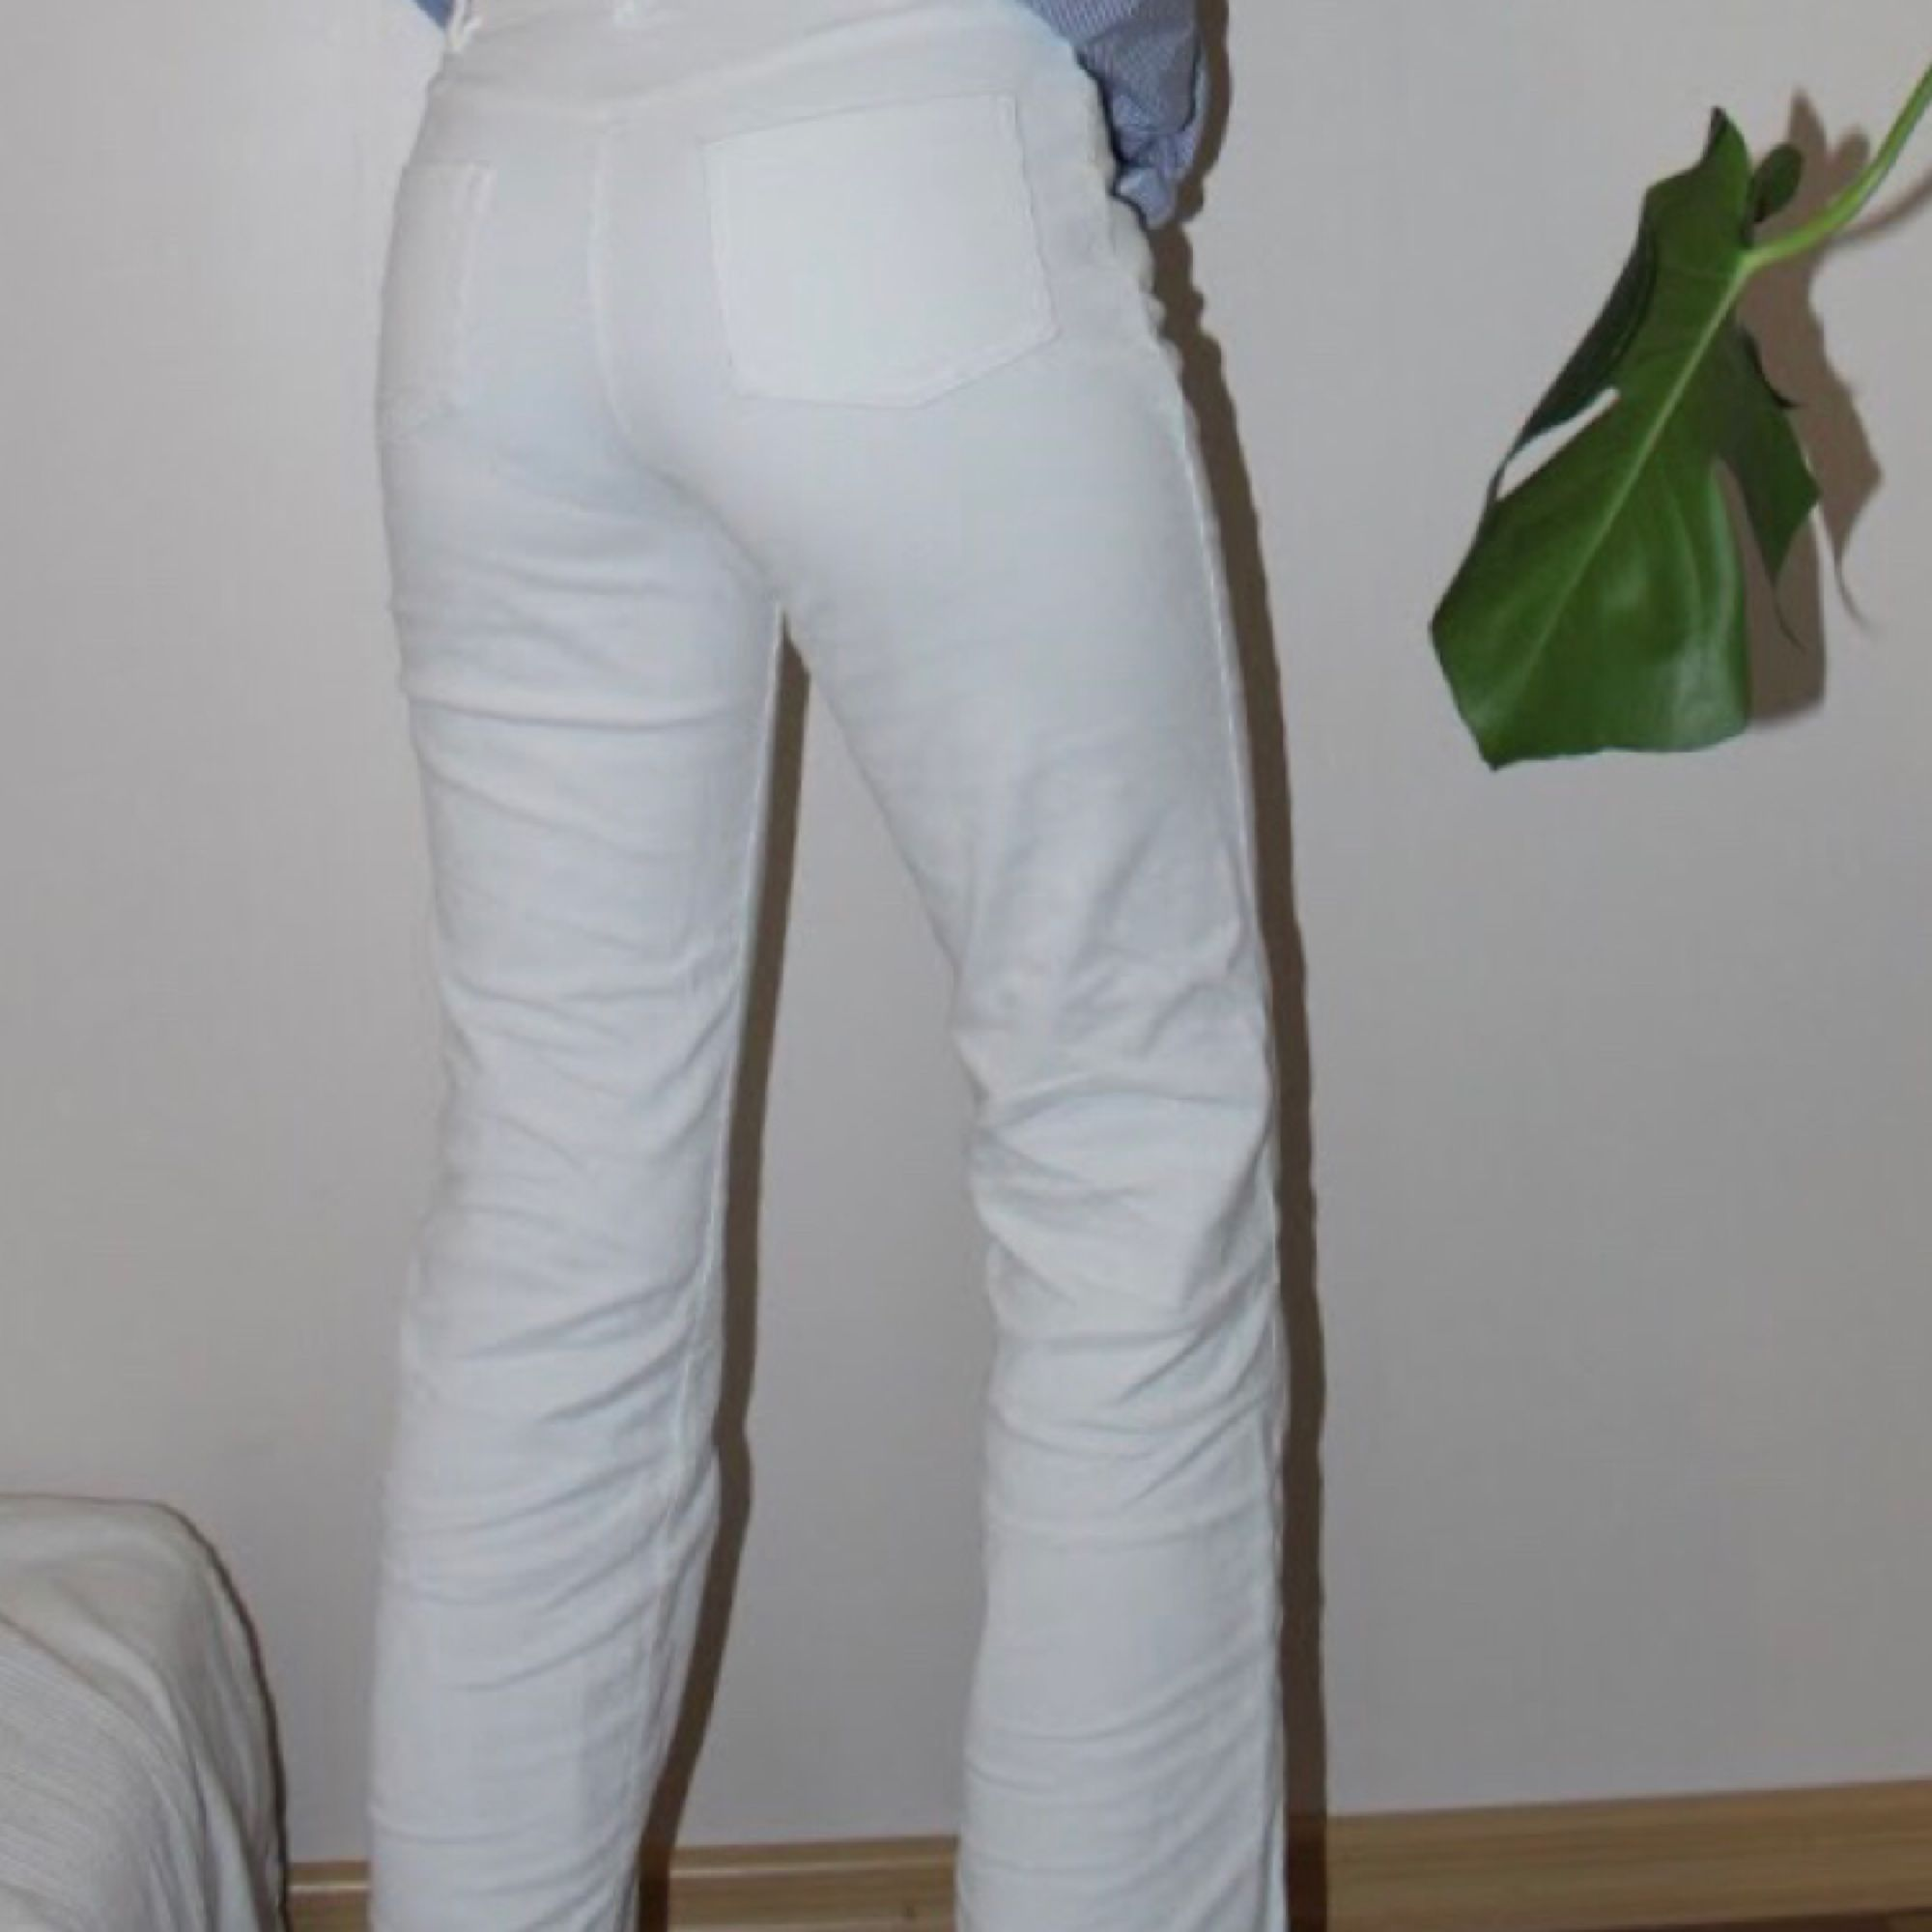 Vita manchesterbyxor. Stuprörsmodell - Jeans   Byxor - Second Hand 94ba078fc61cd